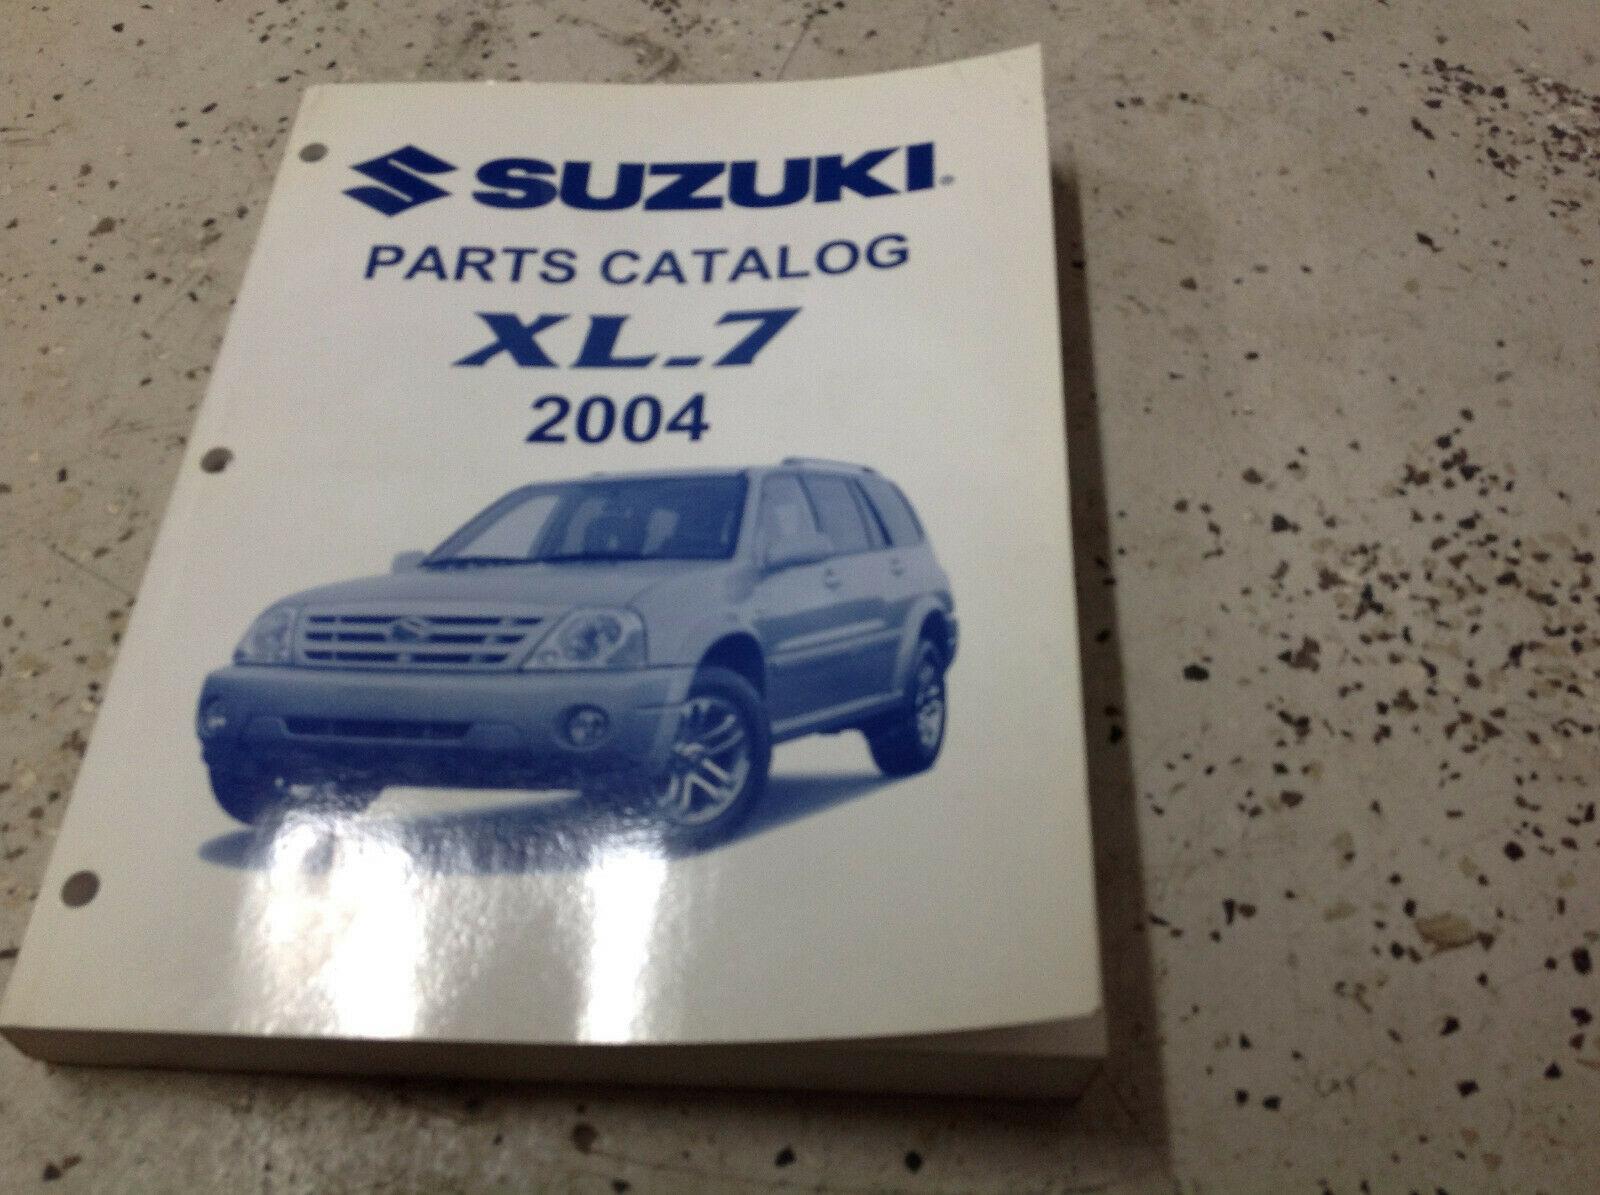 hight resolution of 2004 suzuki xl 7 xl7 parts catalog manual and 50 similar items 57